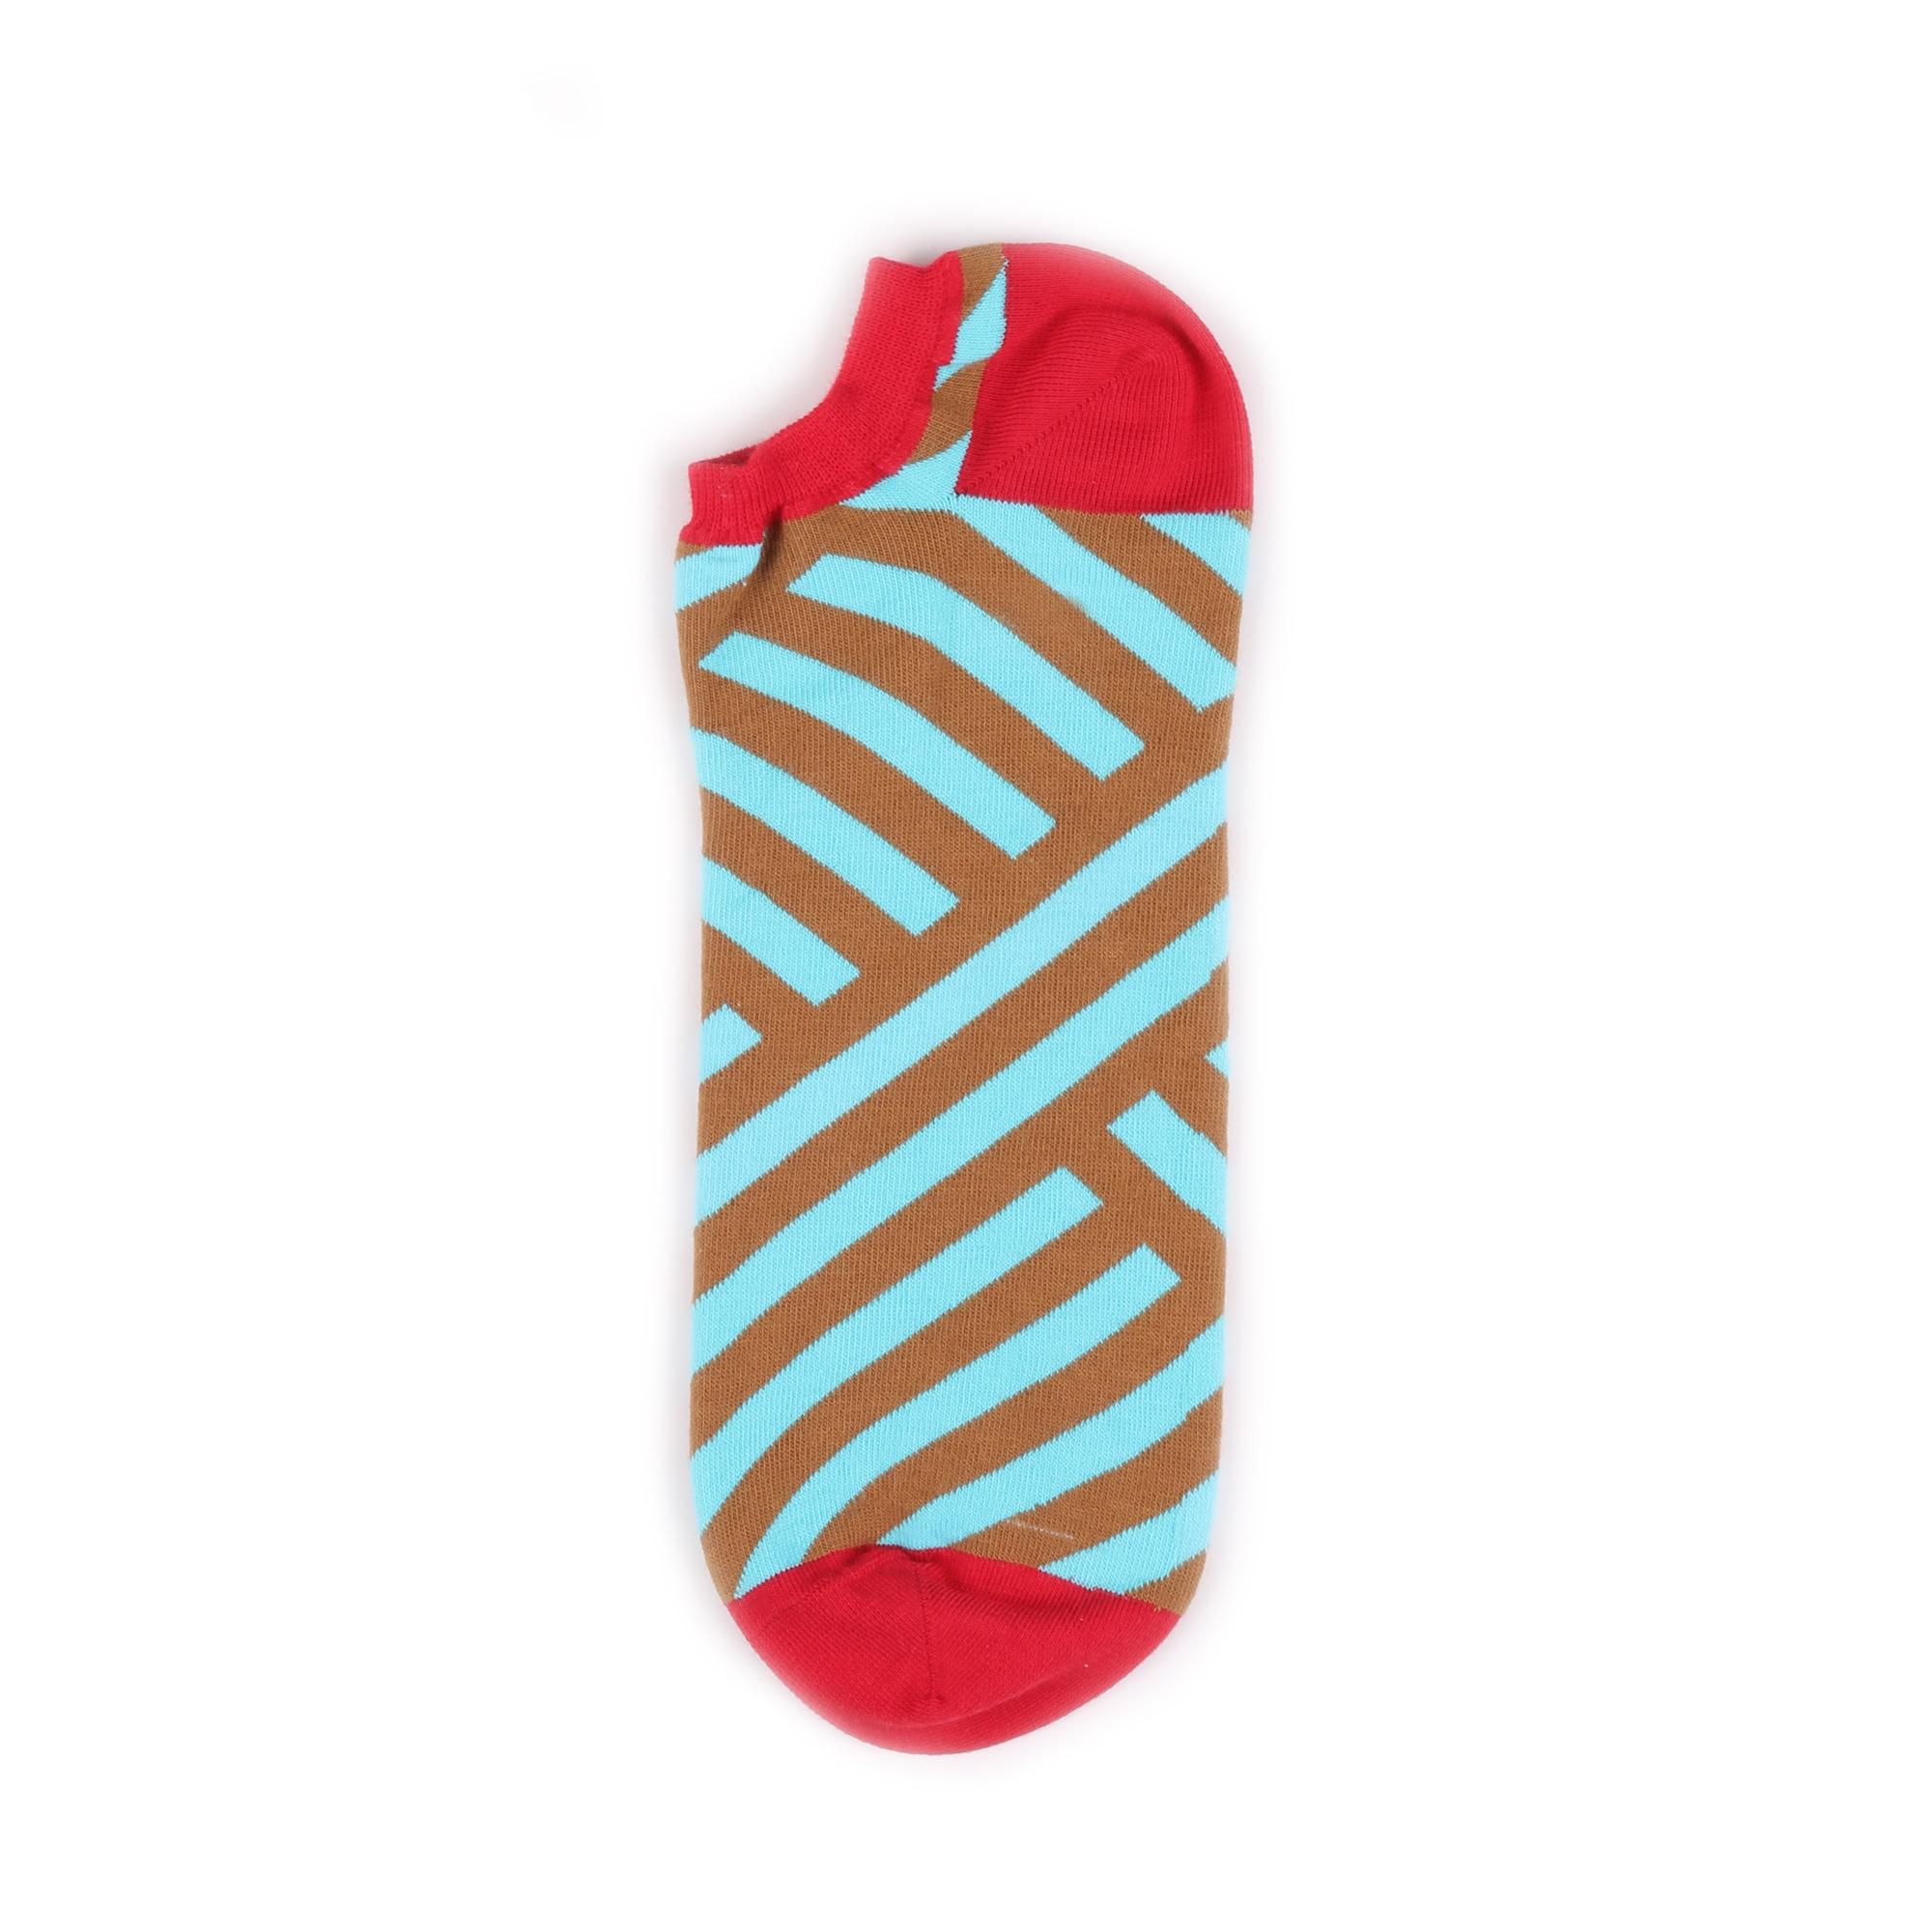 Носки унисекс Burning heels BHAnkleStripe_Brown_Blue голубые 42-46 RU